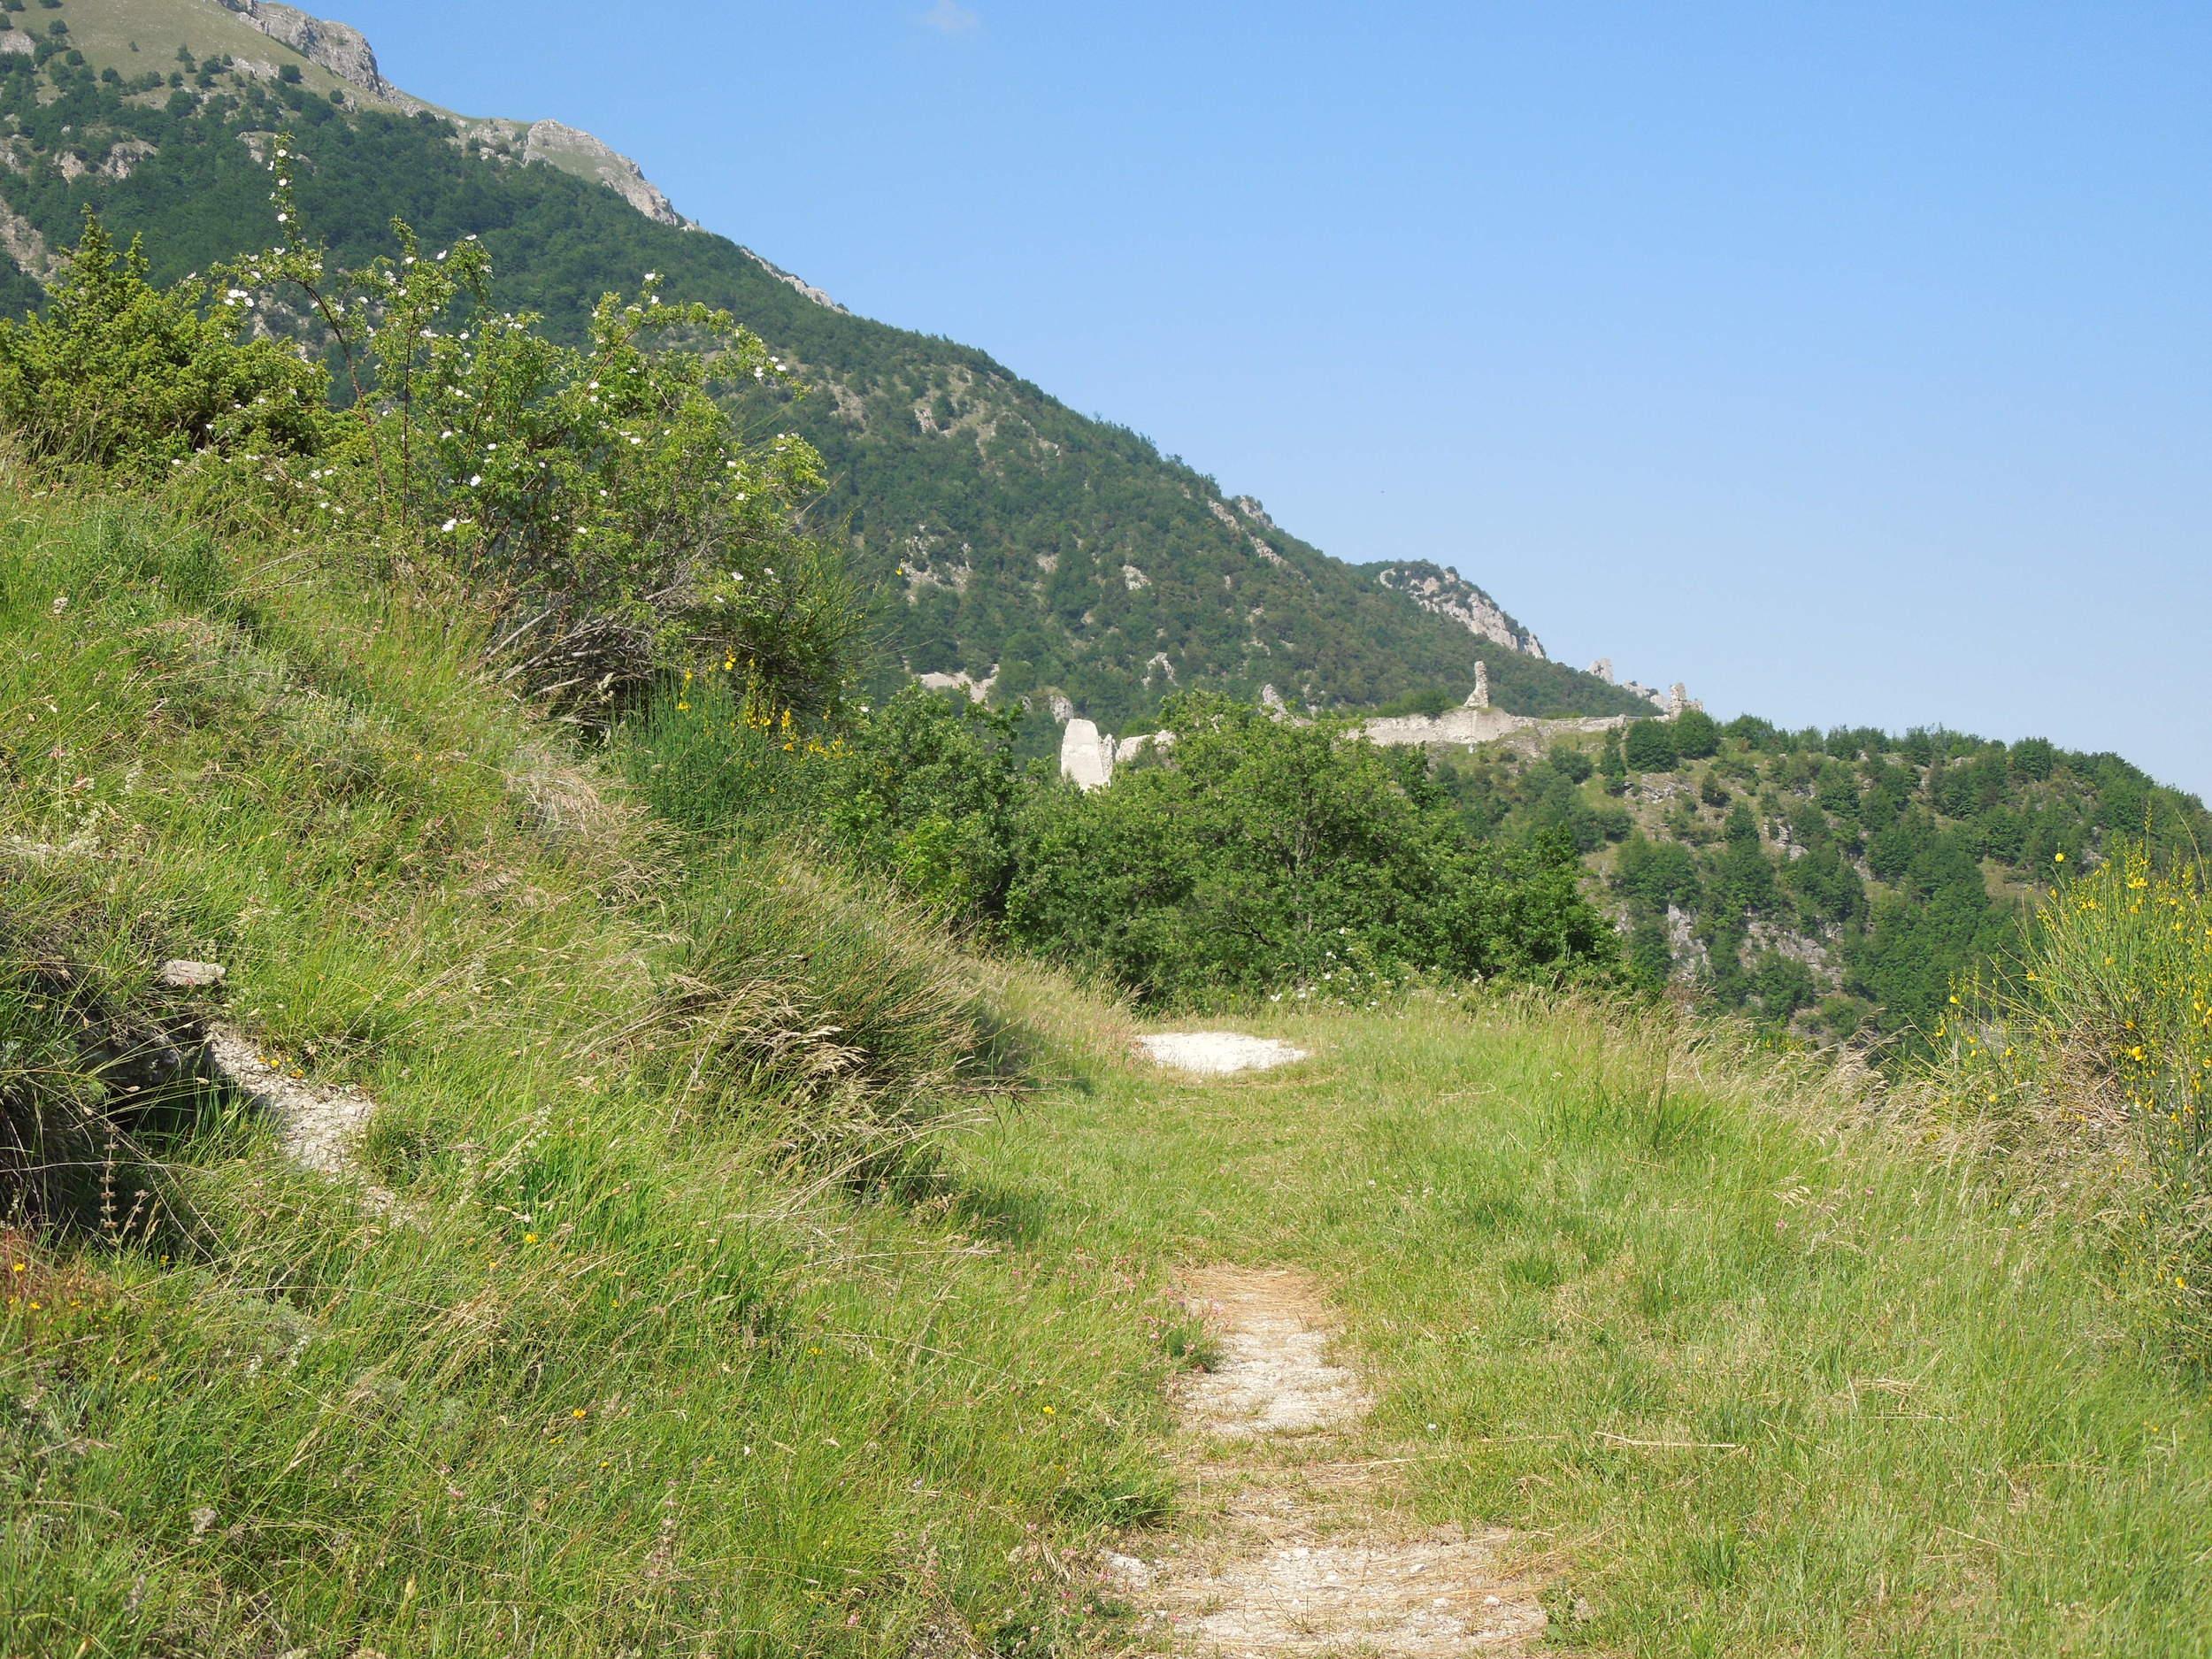 Castel Manfrino (Wikipedia)